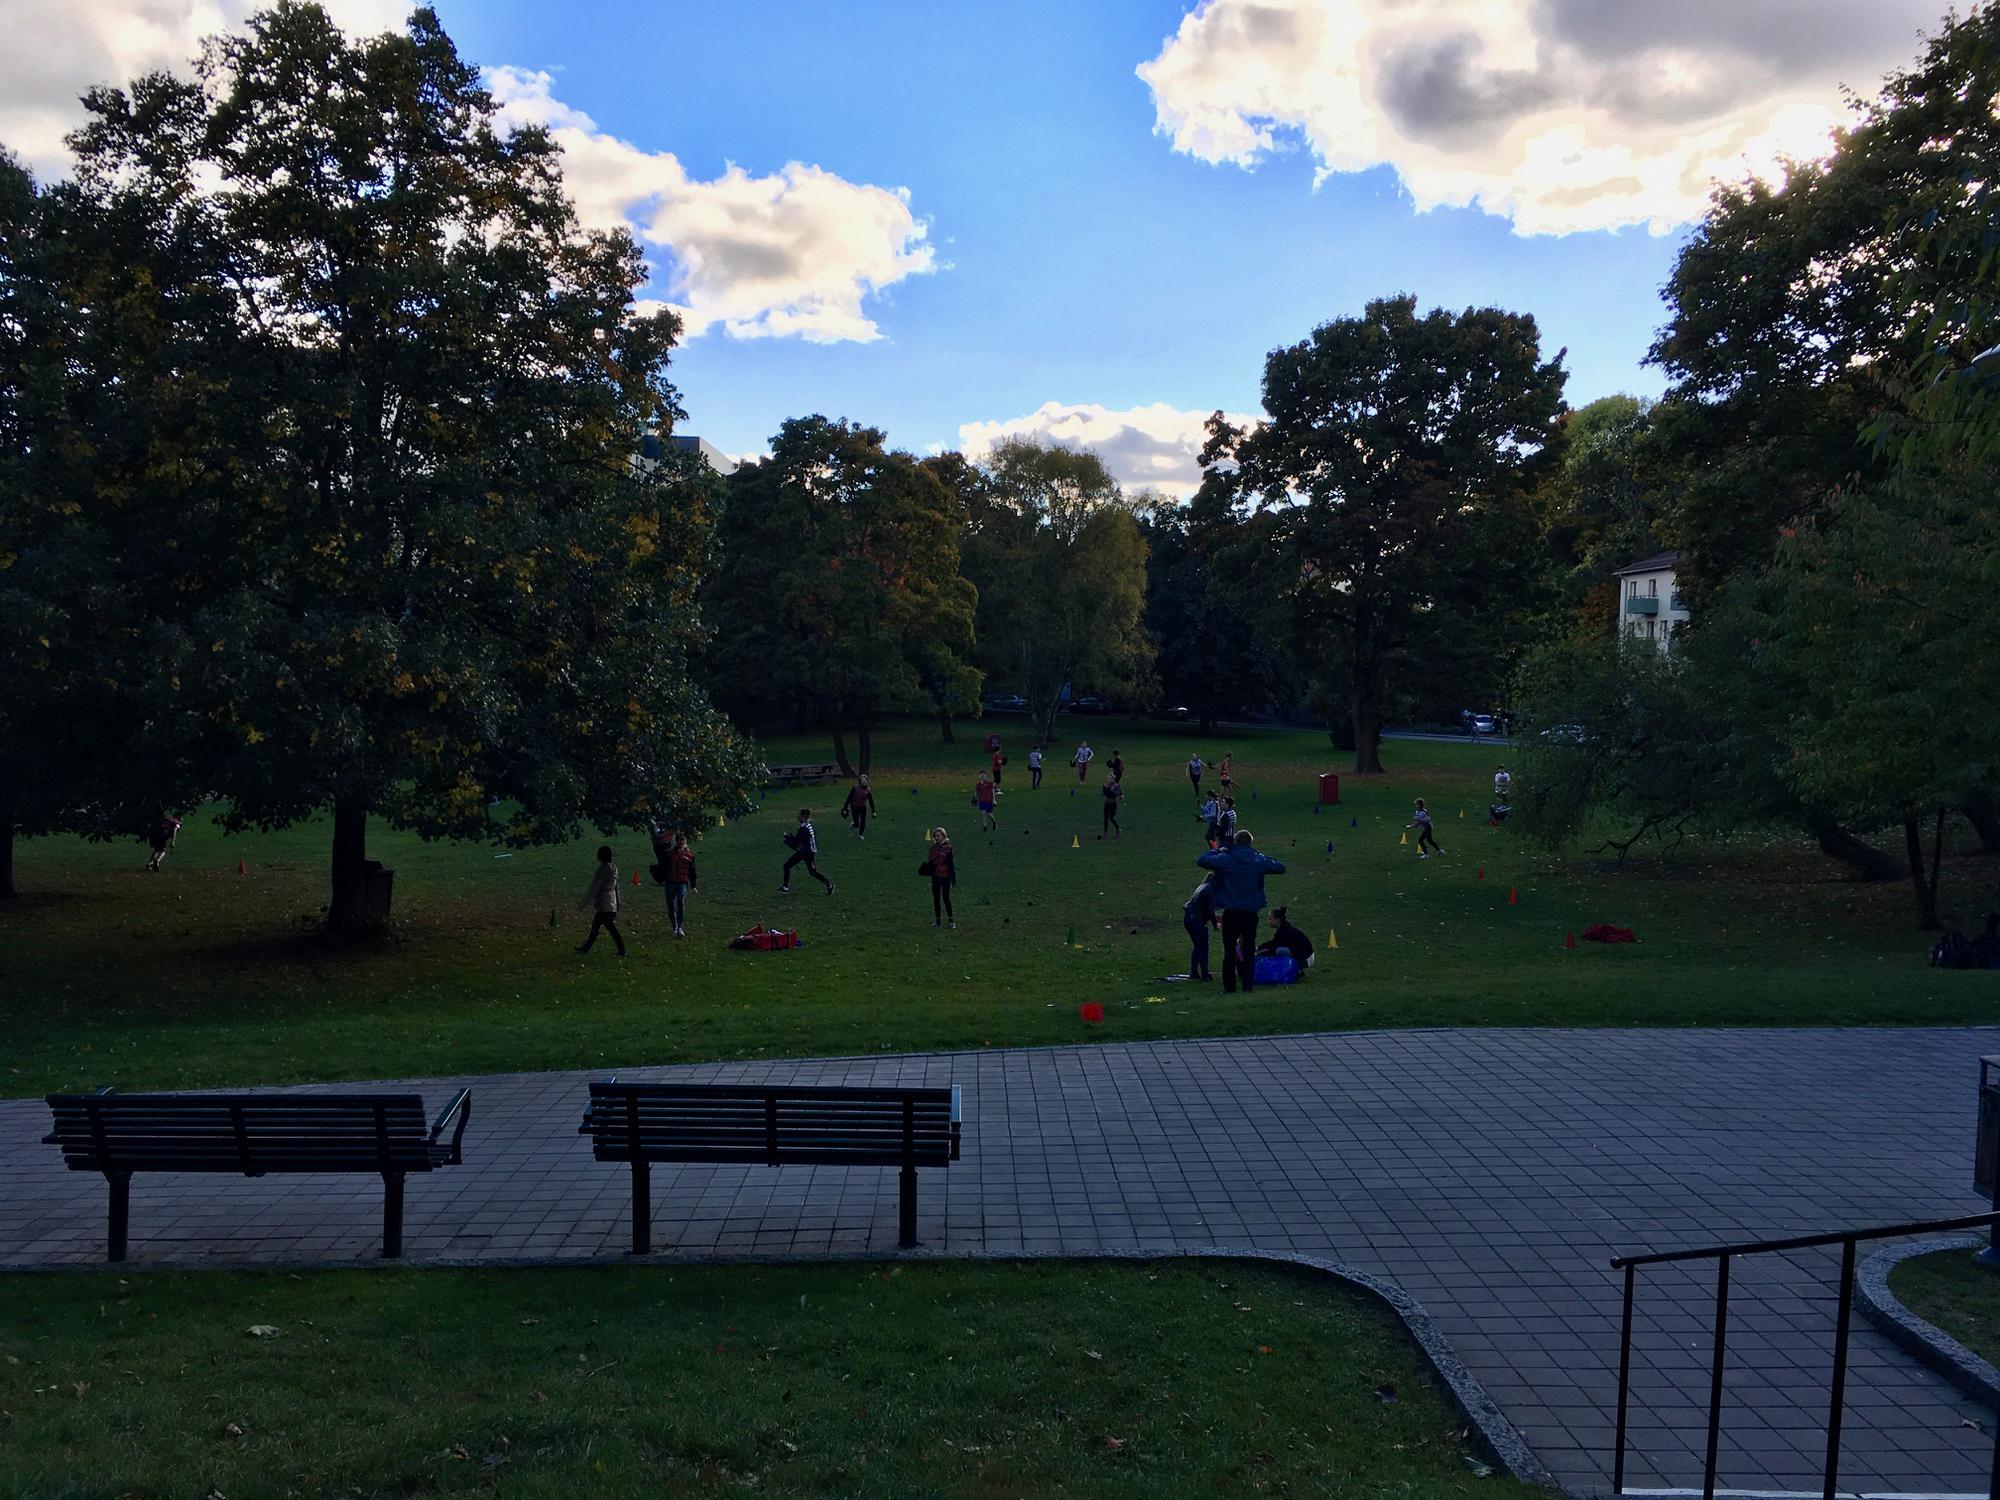 🇸🇪 Стокгольм, Швеция, октябрь 2016.